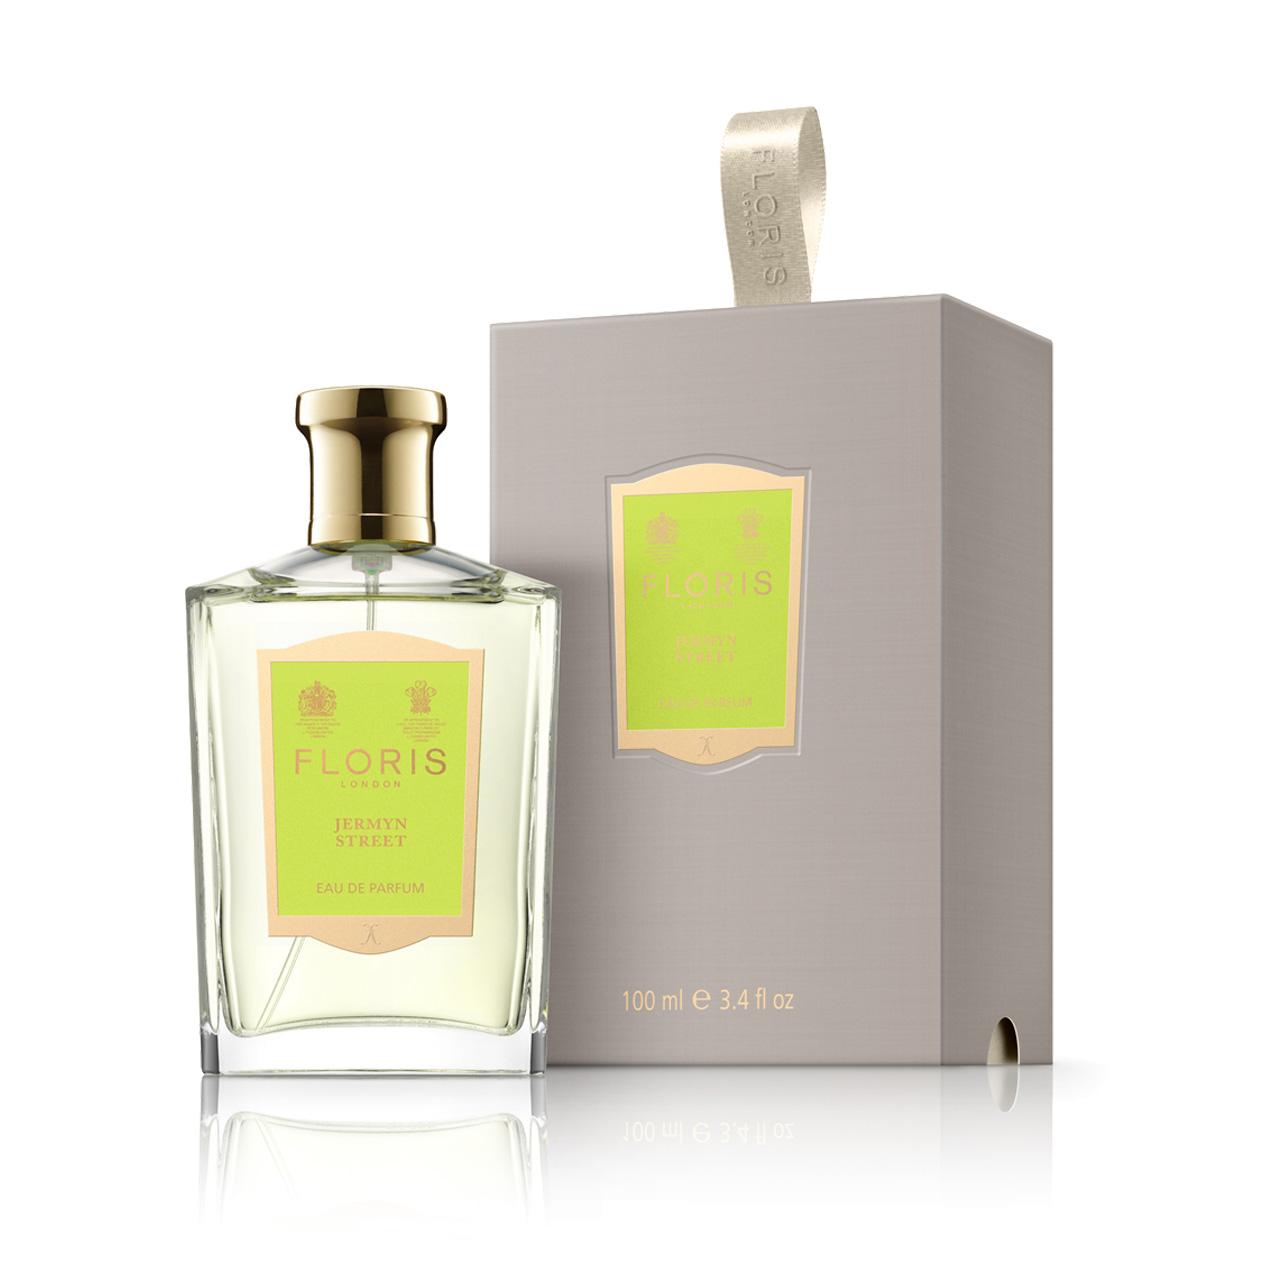 Jermyn Street - Eau de Parfum - Private Collection